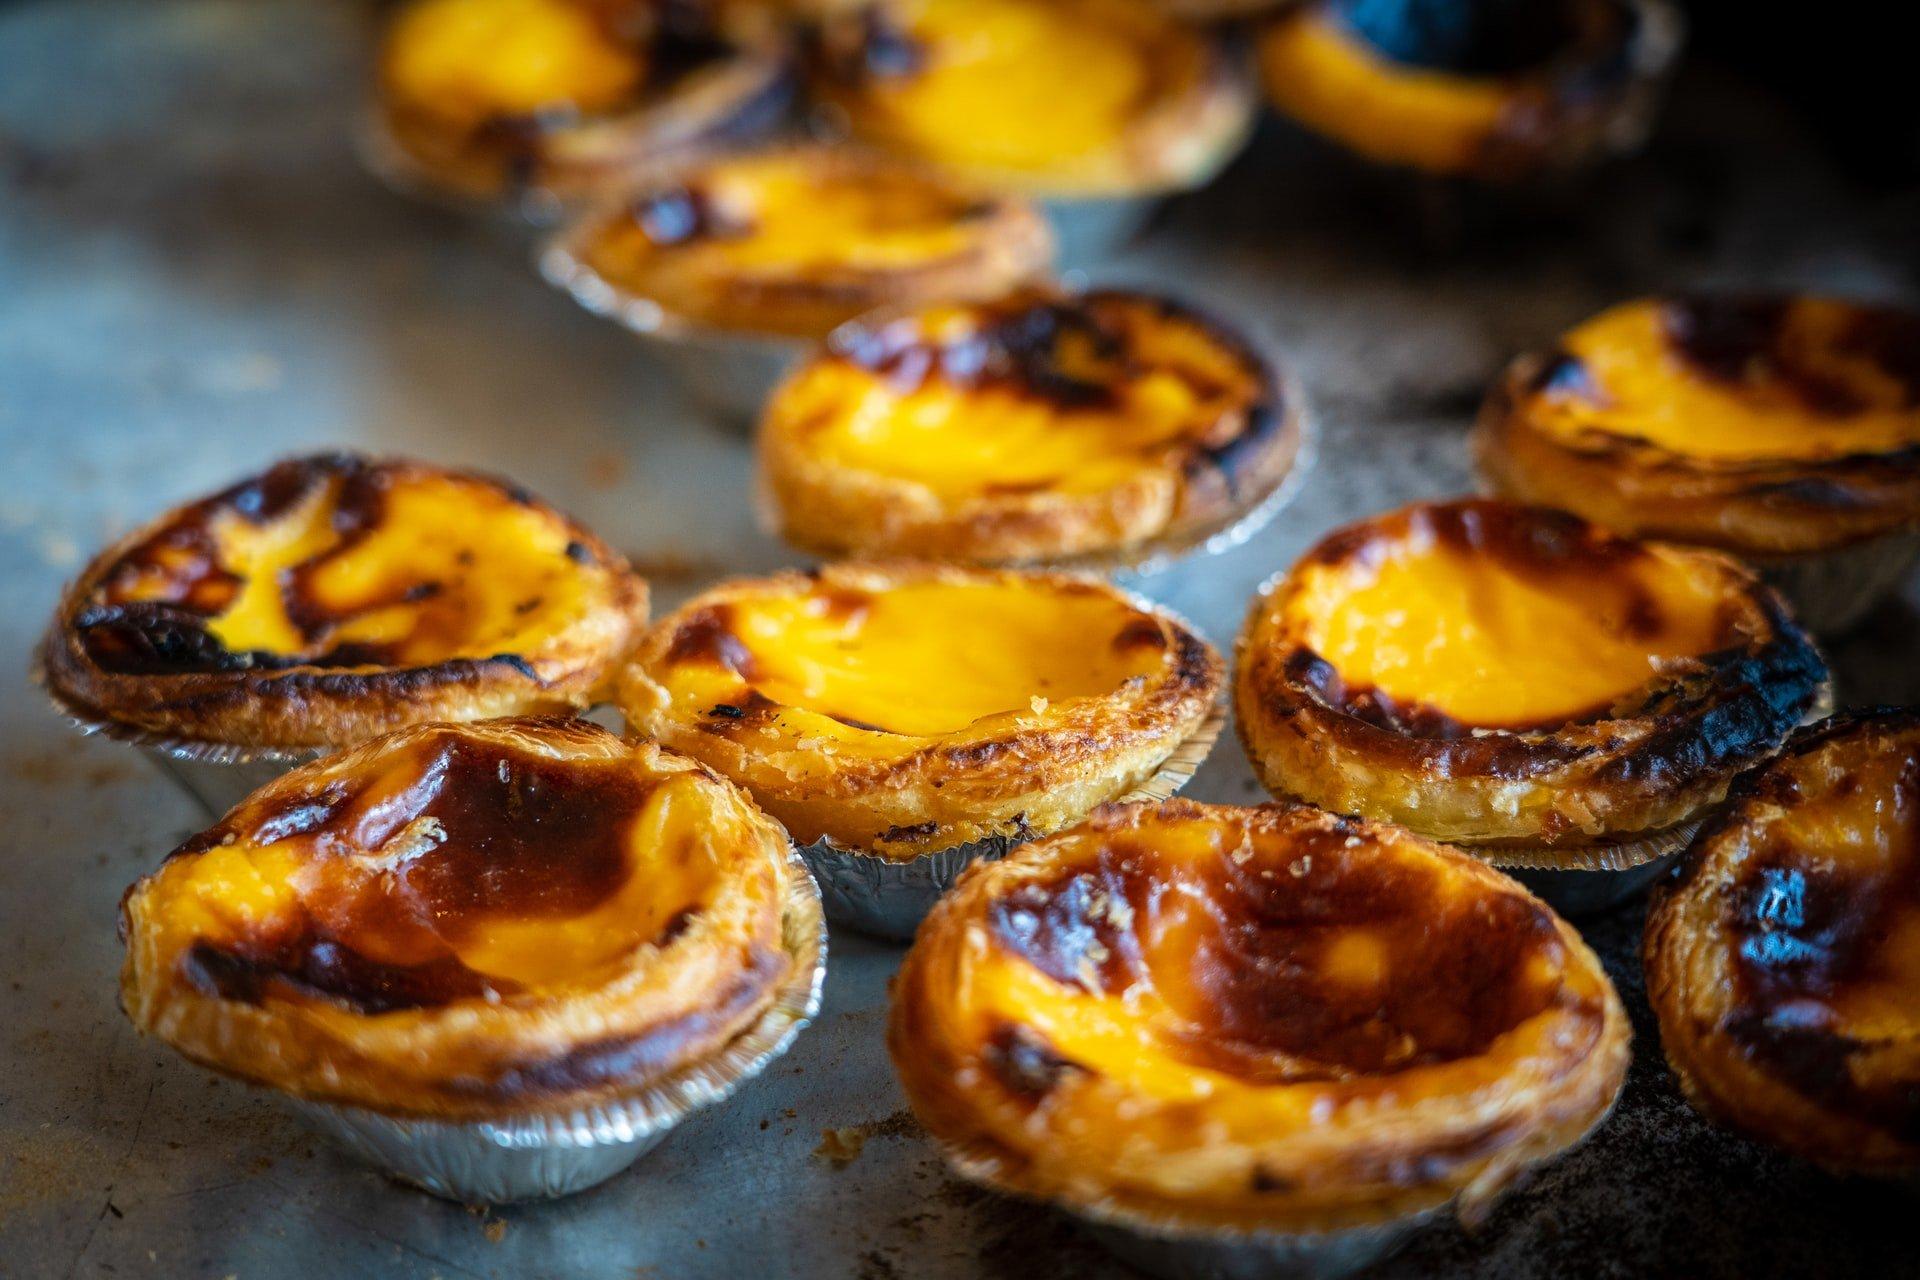 Portuguese egg tart (photo: Nick Fewings)